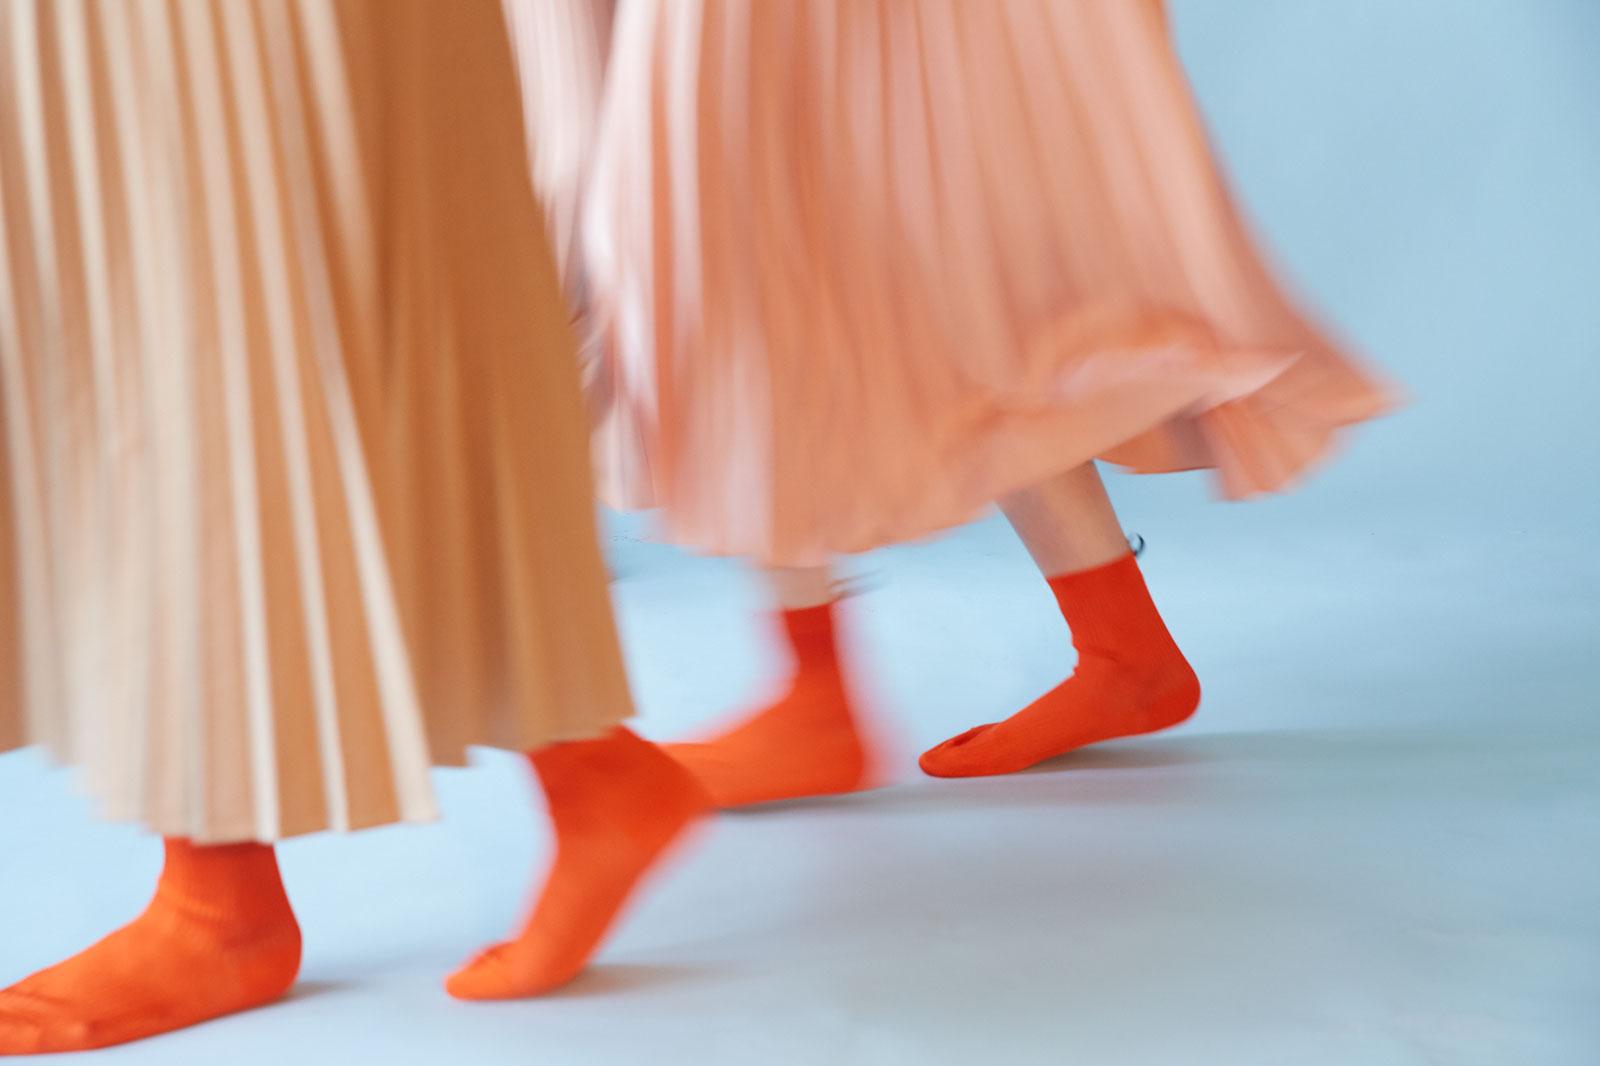 A socks still life story via Doan Ly